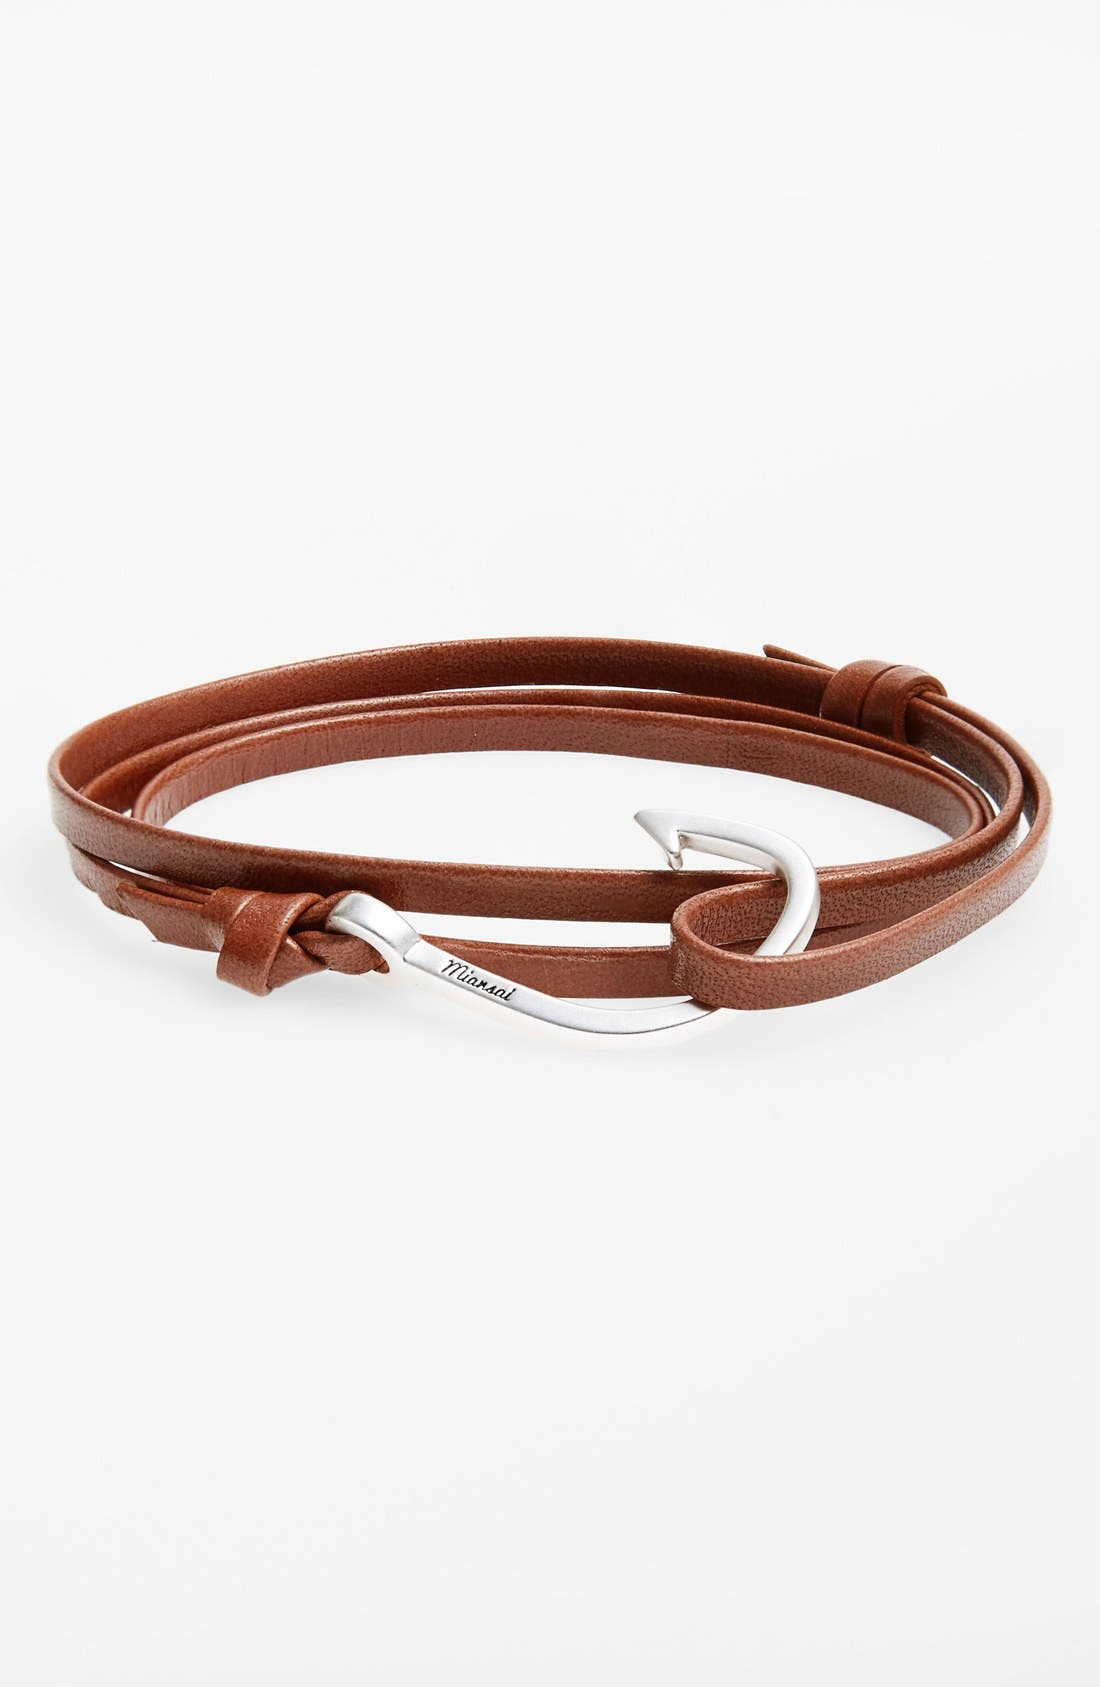 Alternate Image 1 Selected - Miansai Silver Hook Leather Bracelet